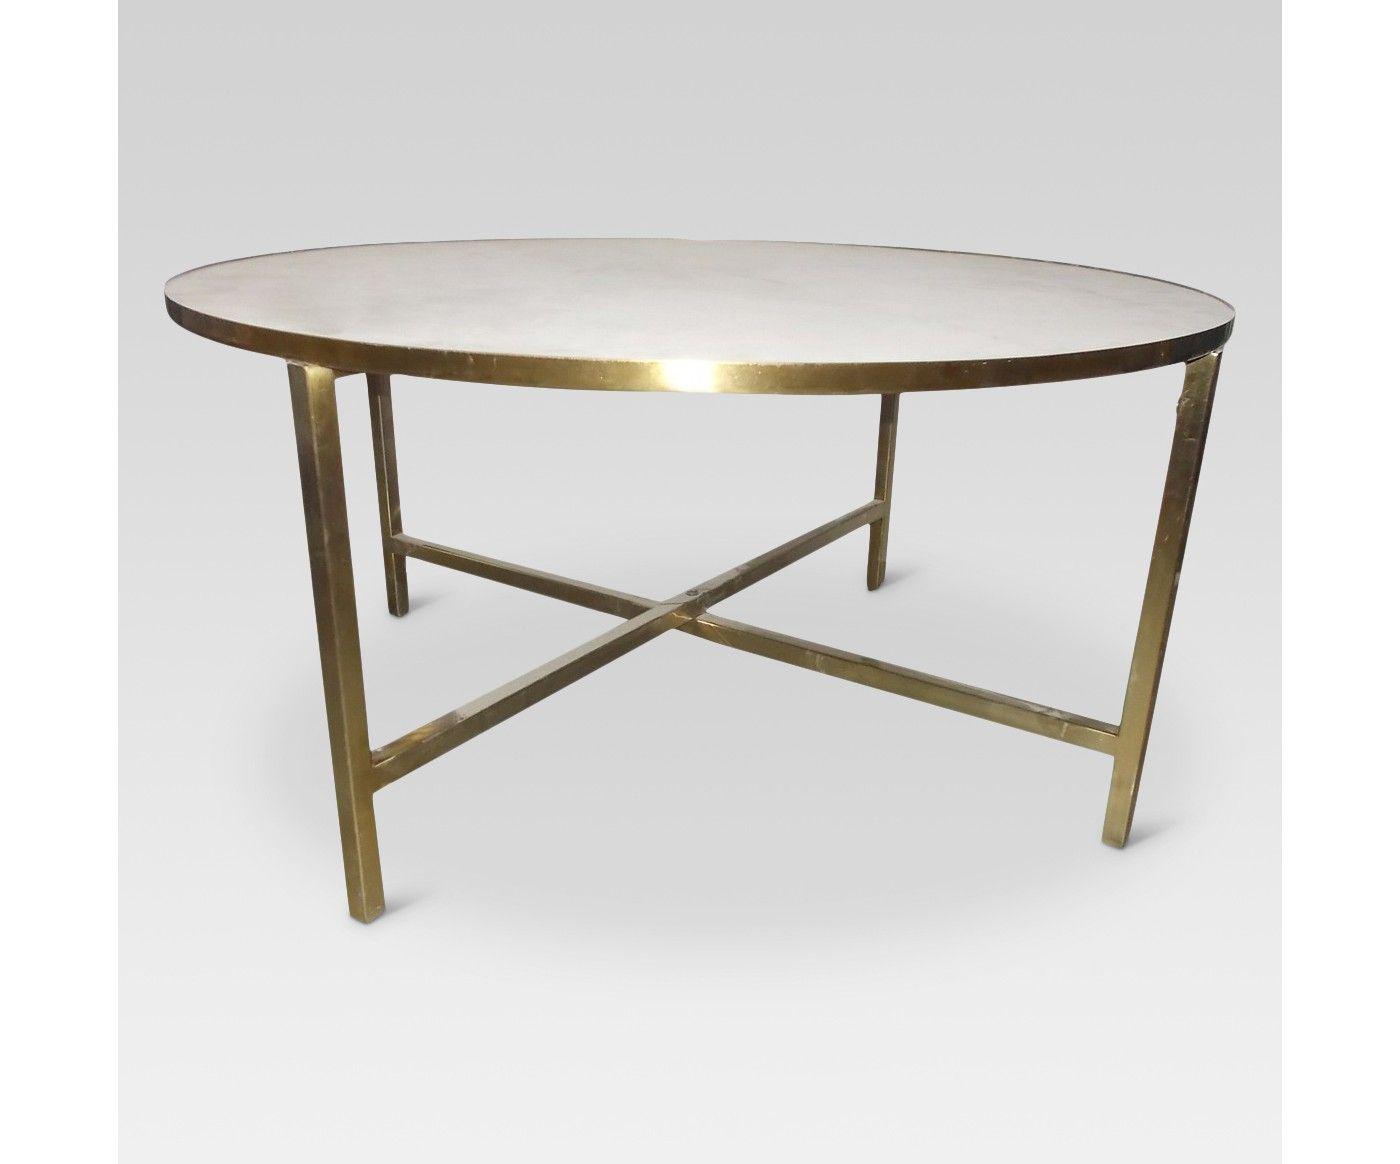 Marlton Round Coffee Table Threshold Image 1 Of 7 Coffee Table Round Coffee Table [ 1164 x 1400 Pixel ]